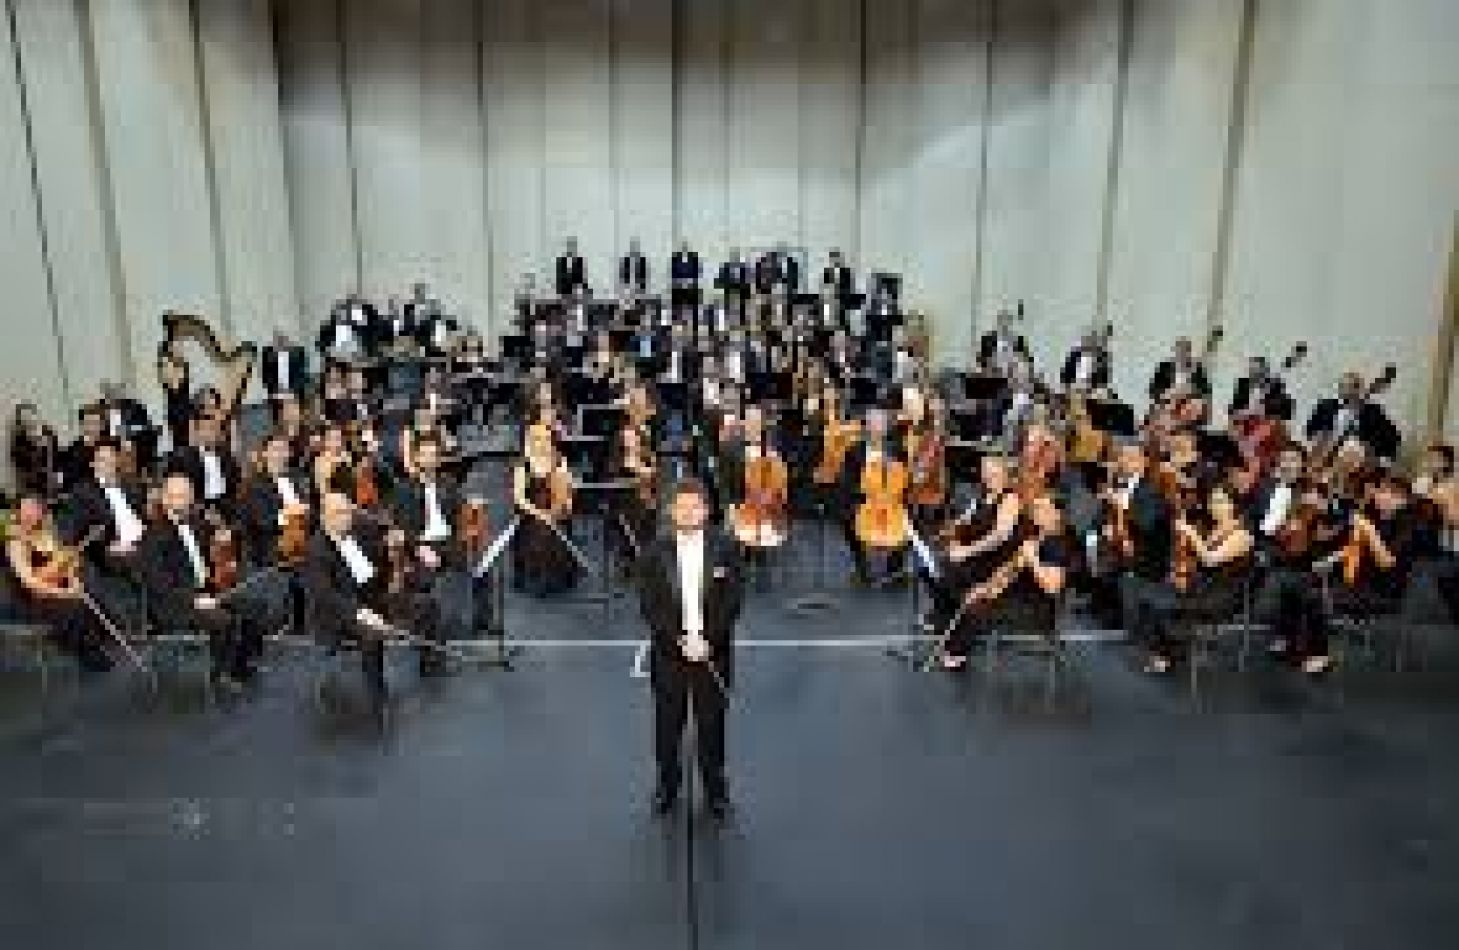 Orquesta sinfónica de Salta